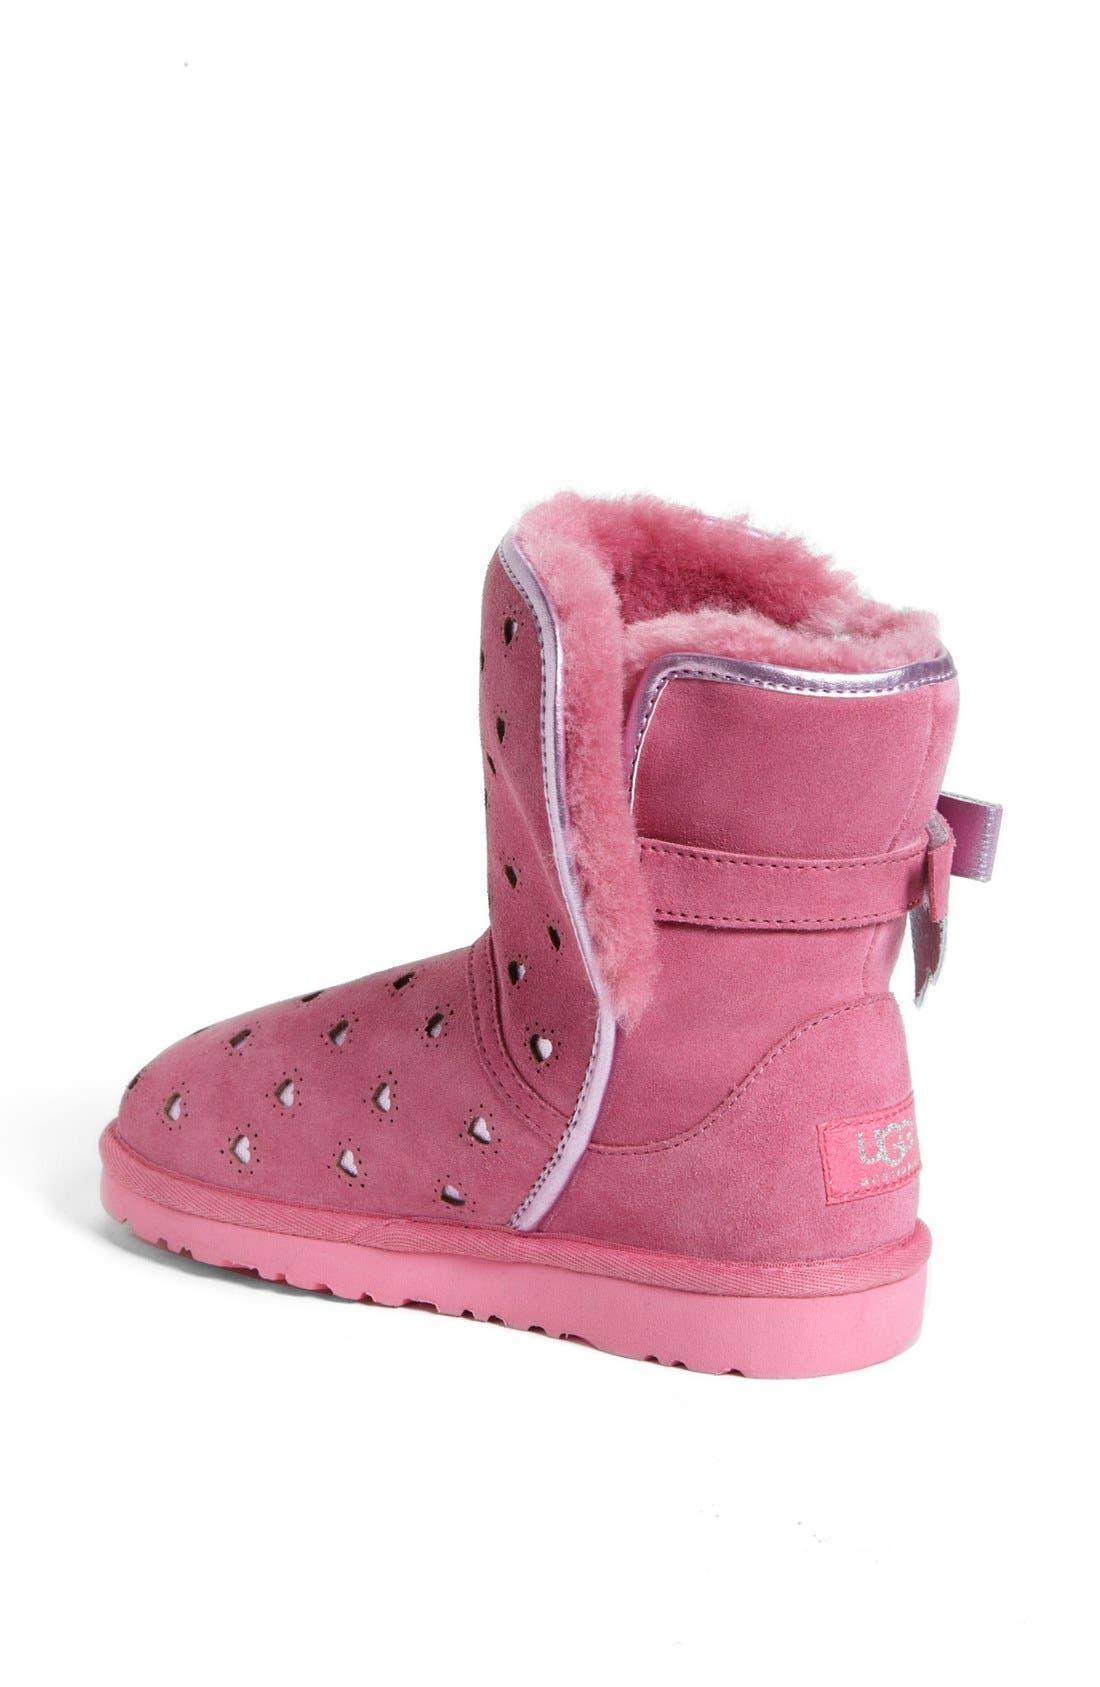 Alternate Image 2  - UGG® Australia 'Joleigh Glitter' Boot (Toddler, Little Kid & Big Kid) (Nordstrom Exclusive)